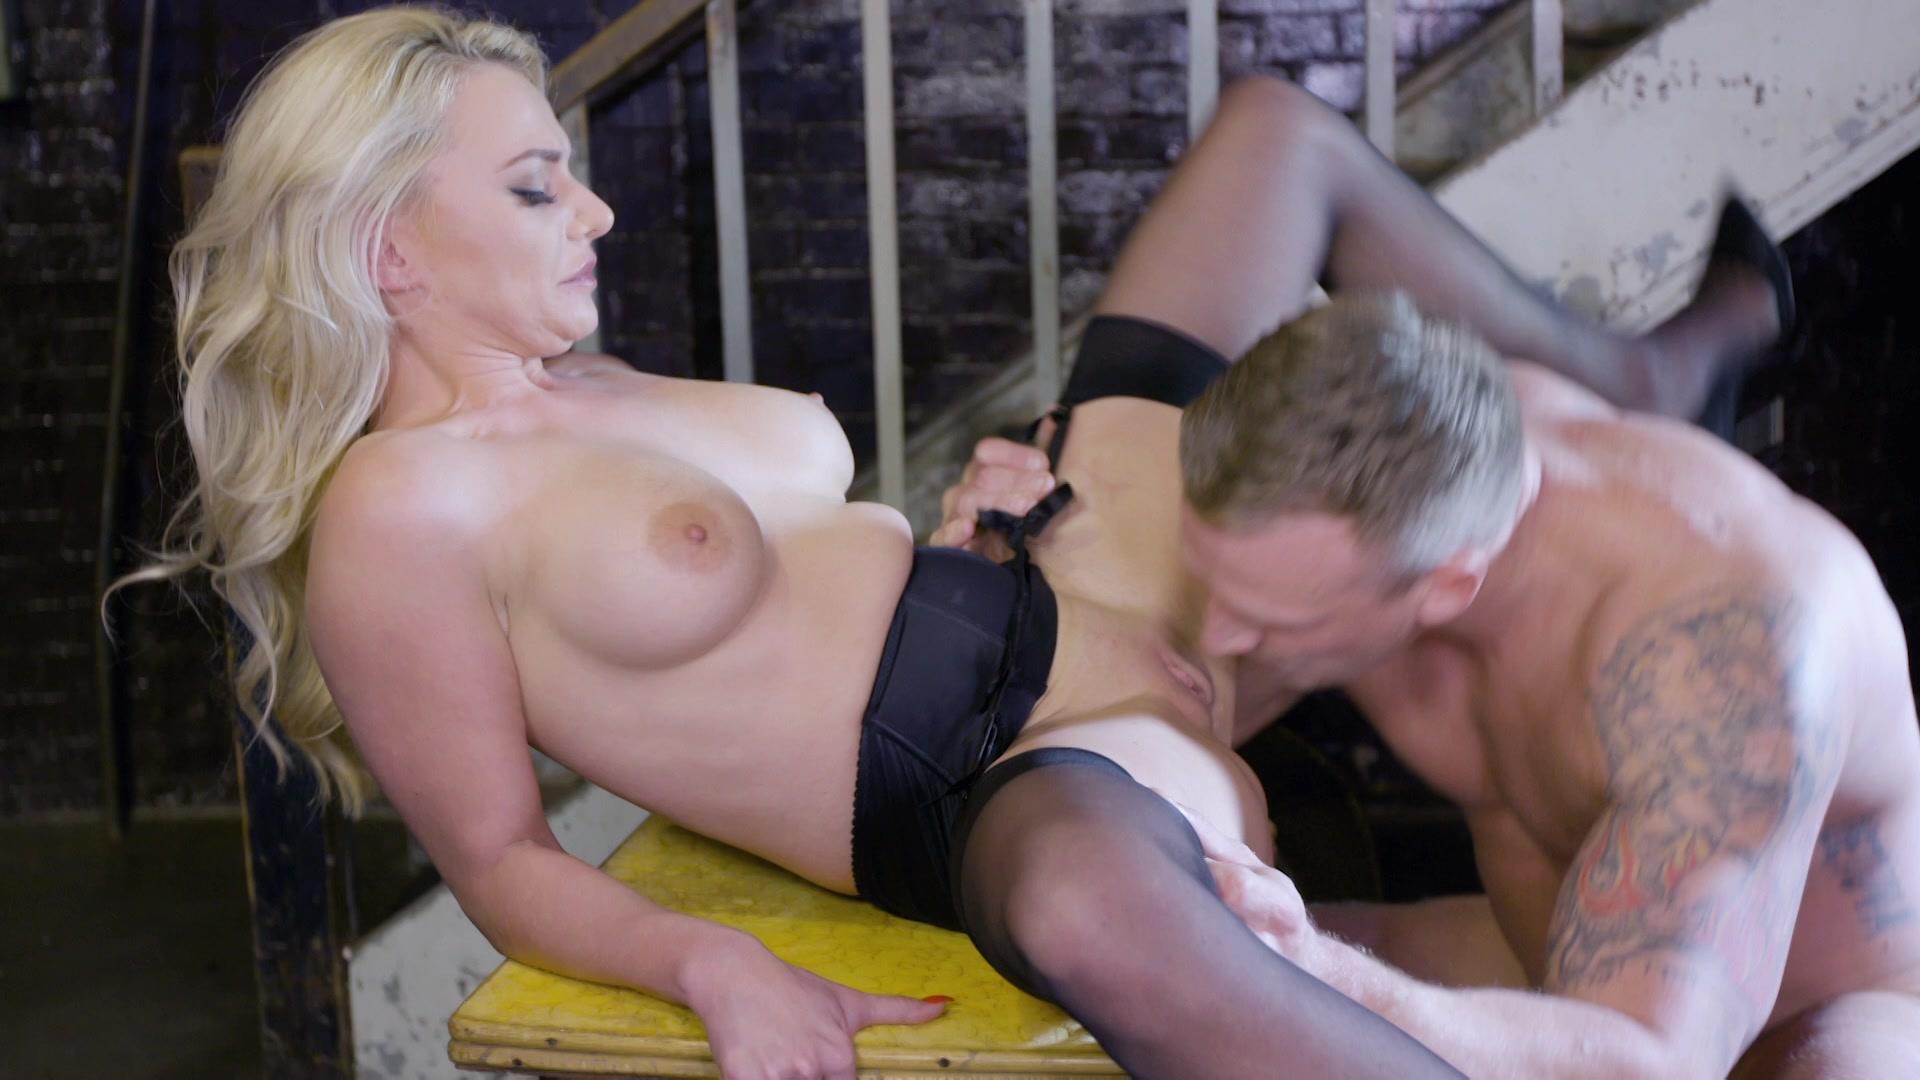 Mykiwis Porno Show social media sexy influencers | private | adult dvd empire